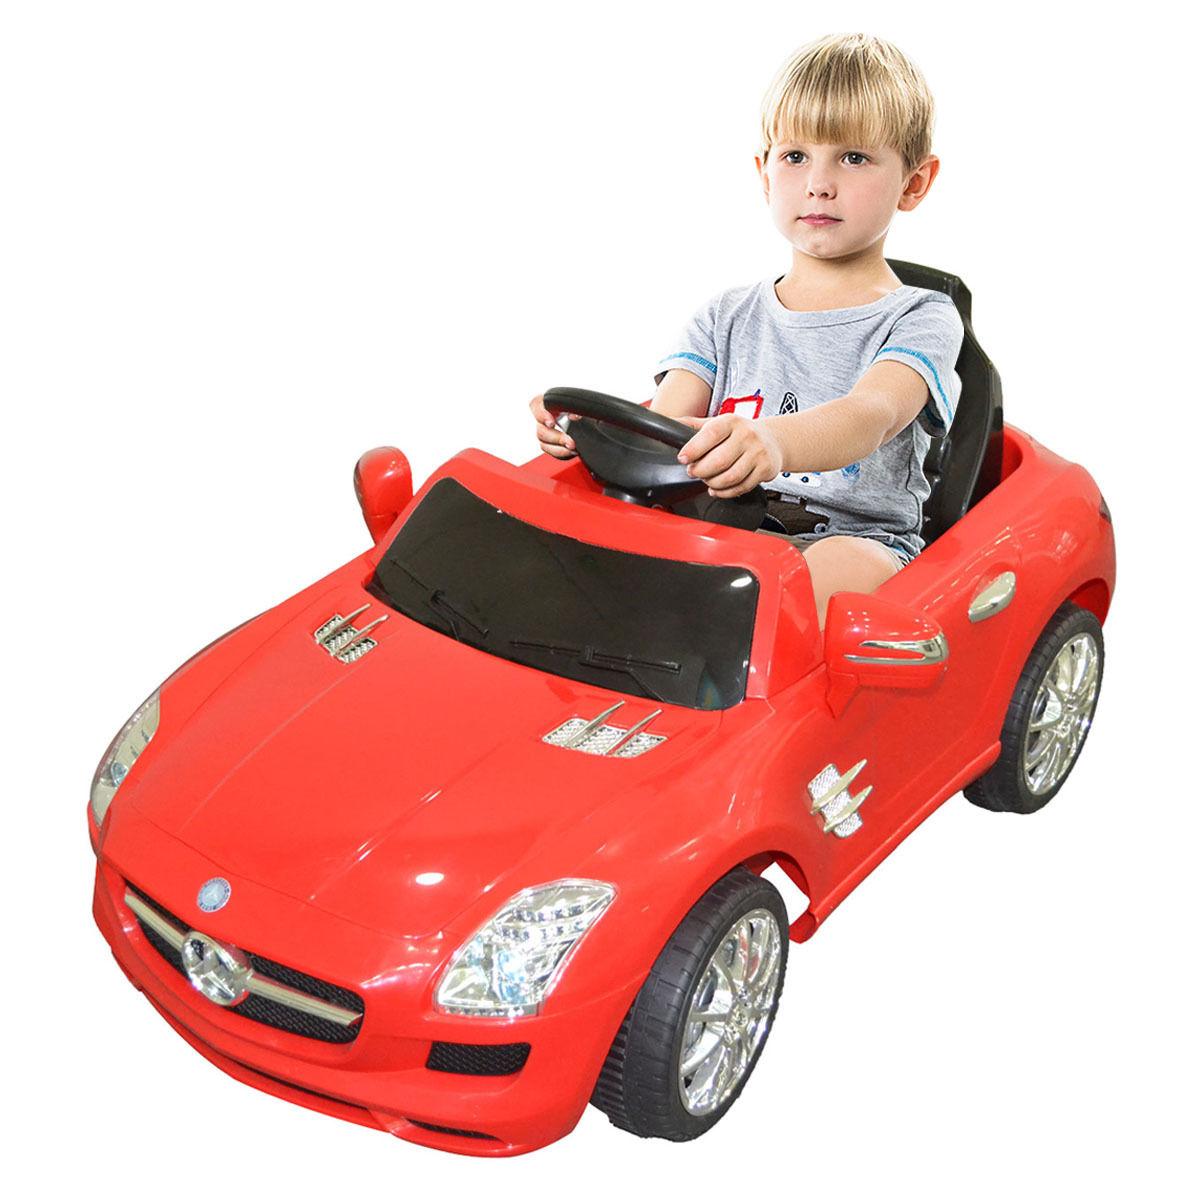 Costway Costway Red Mercedes Benz Sls R C Mp3 Kids Ride On Car Electric Battery Toy Rakuten Com